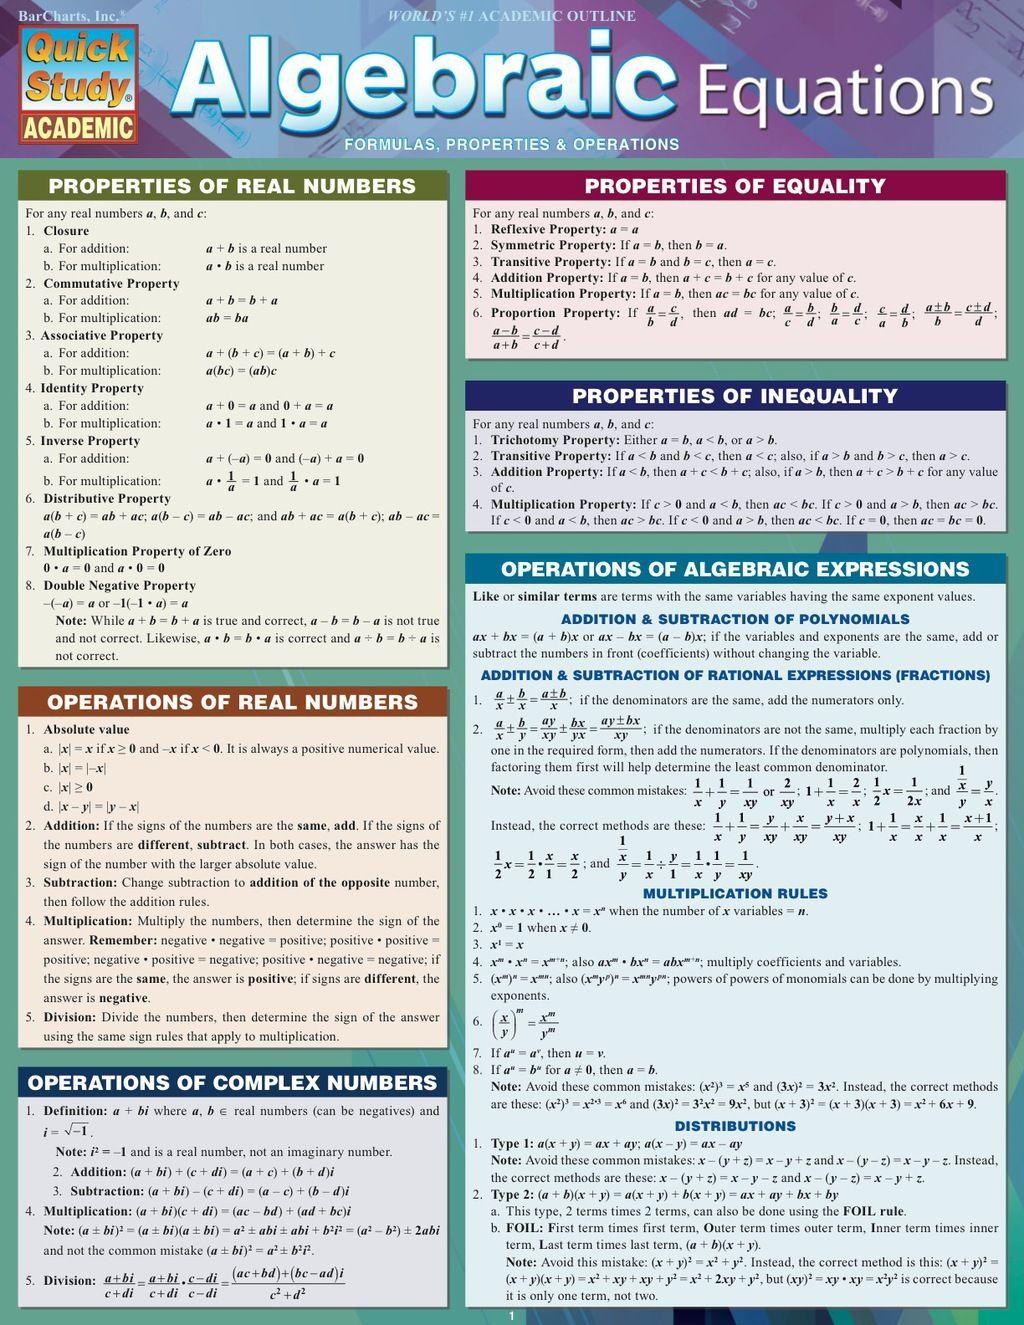 Quickstudy Algebraic Equations Ebook Rental